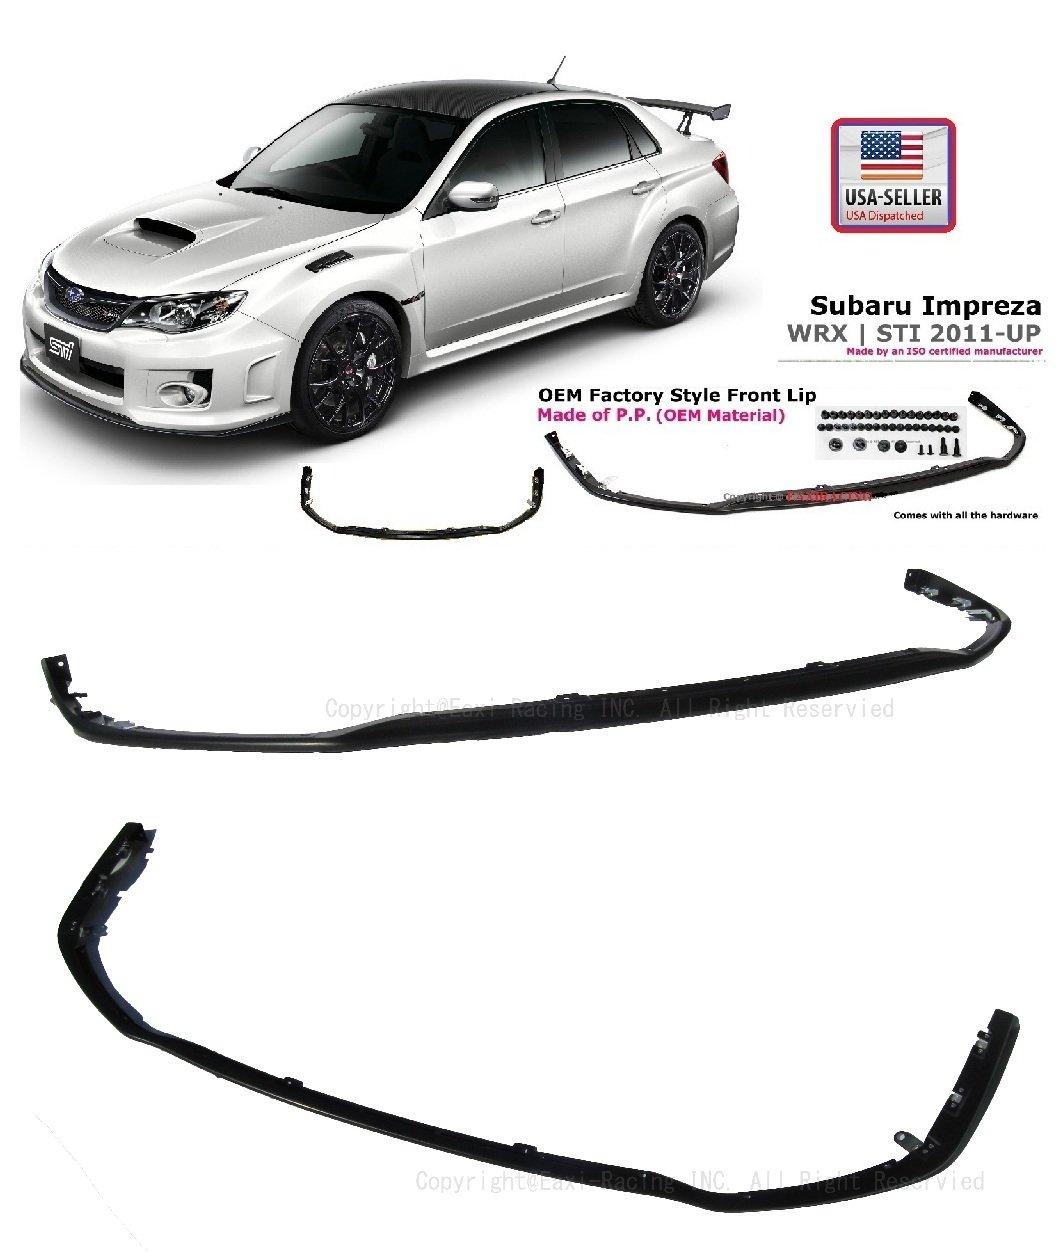 2011-2012 Subaru Impreza WRX STI V-limited Front Bumper JDM P.p. Lip Spoiler